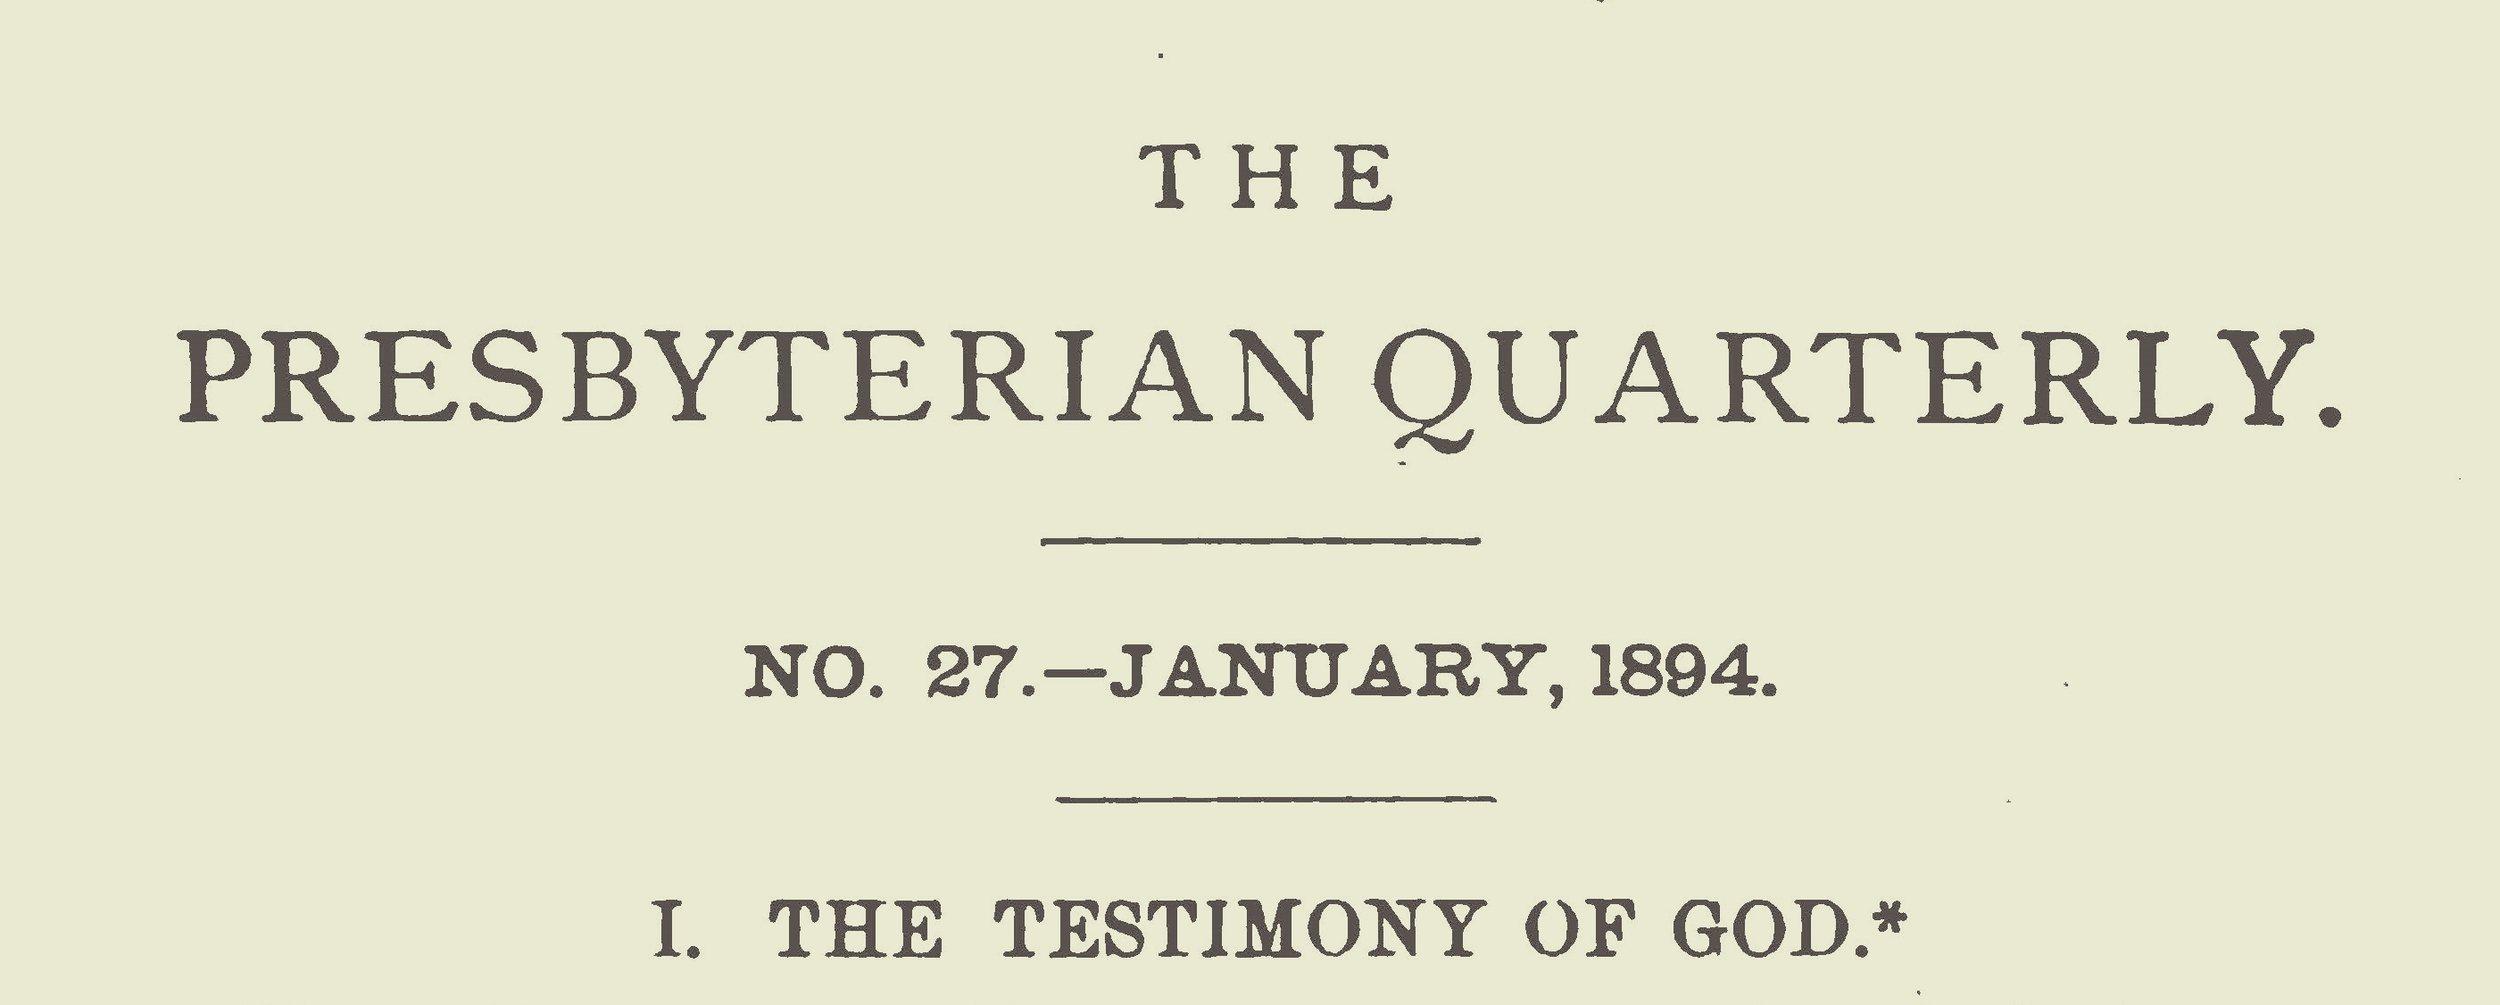 Webb, Robert Alexander, The Testimony of God Title Page.jpg